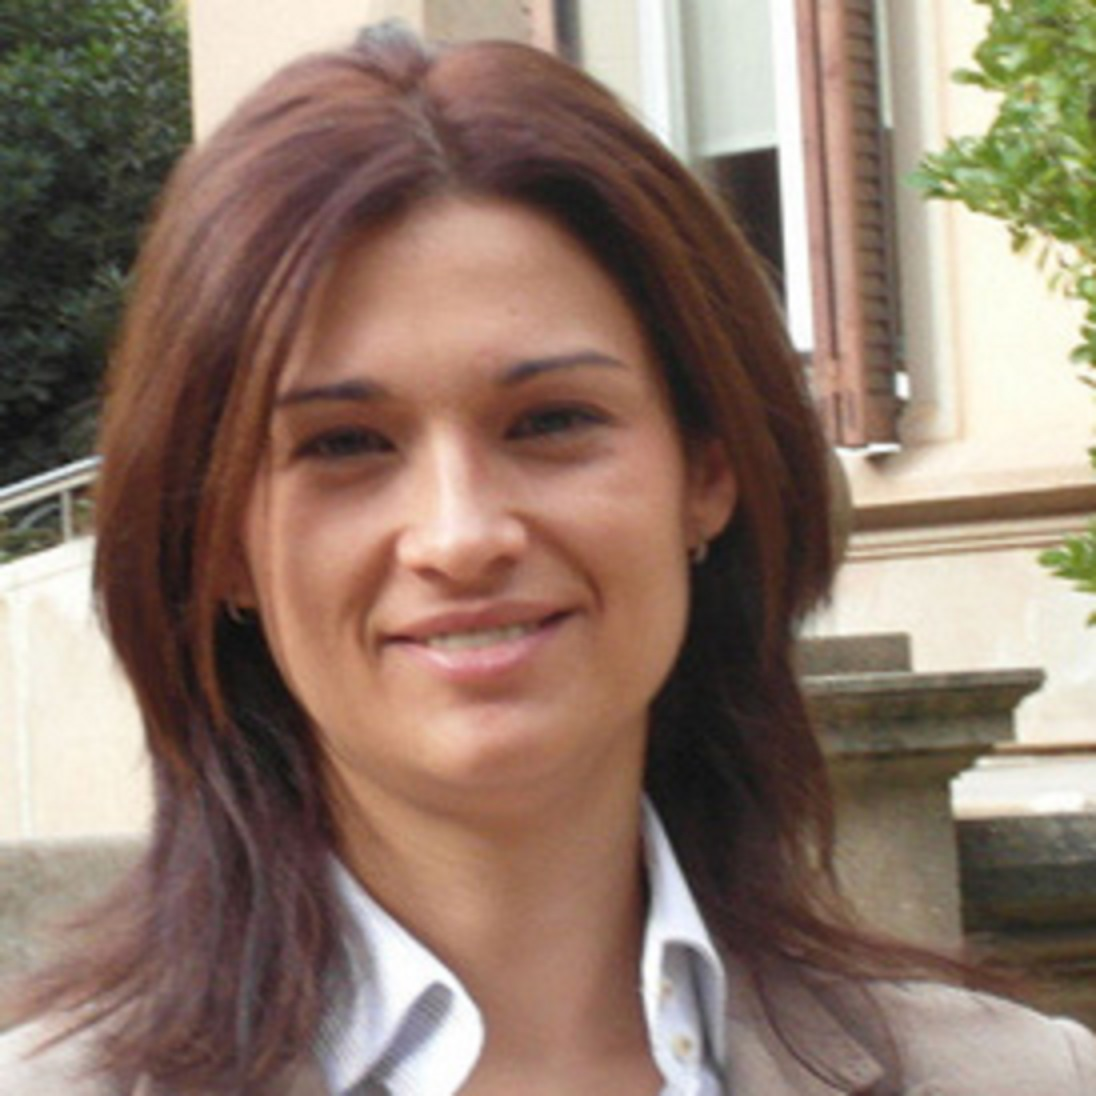 Sílvia Trabalon Duran